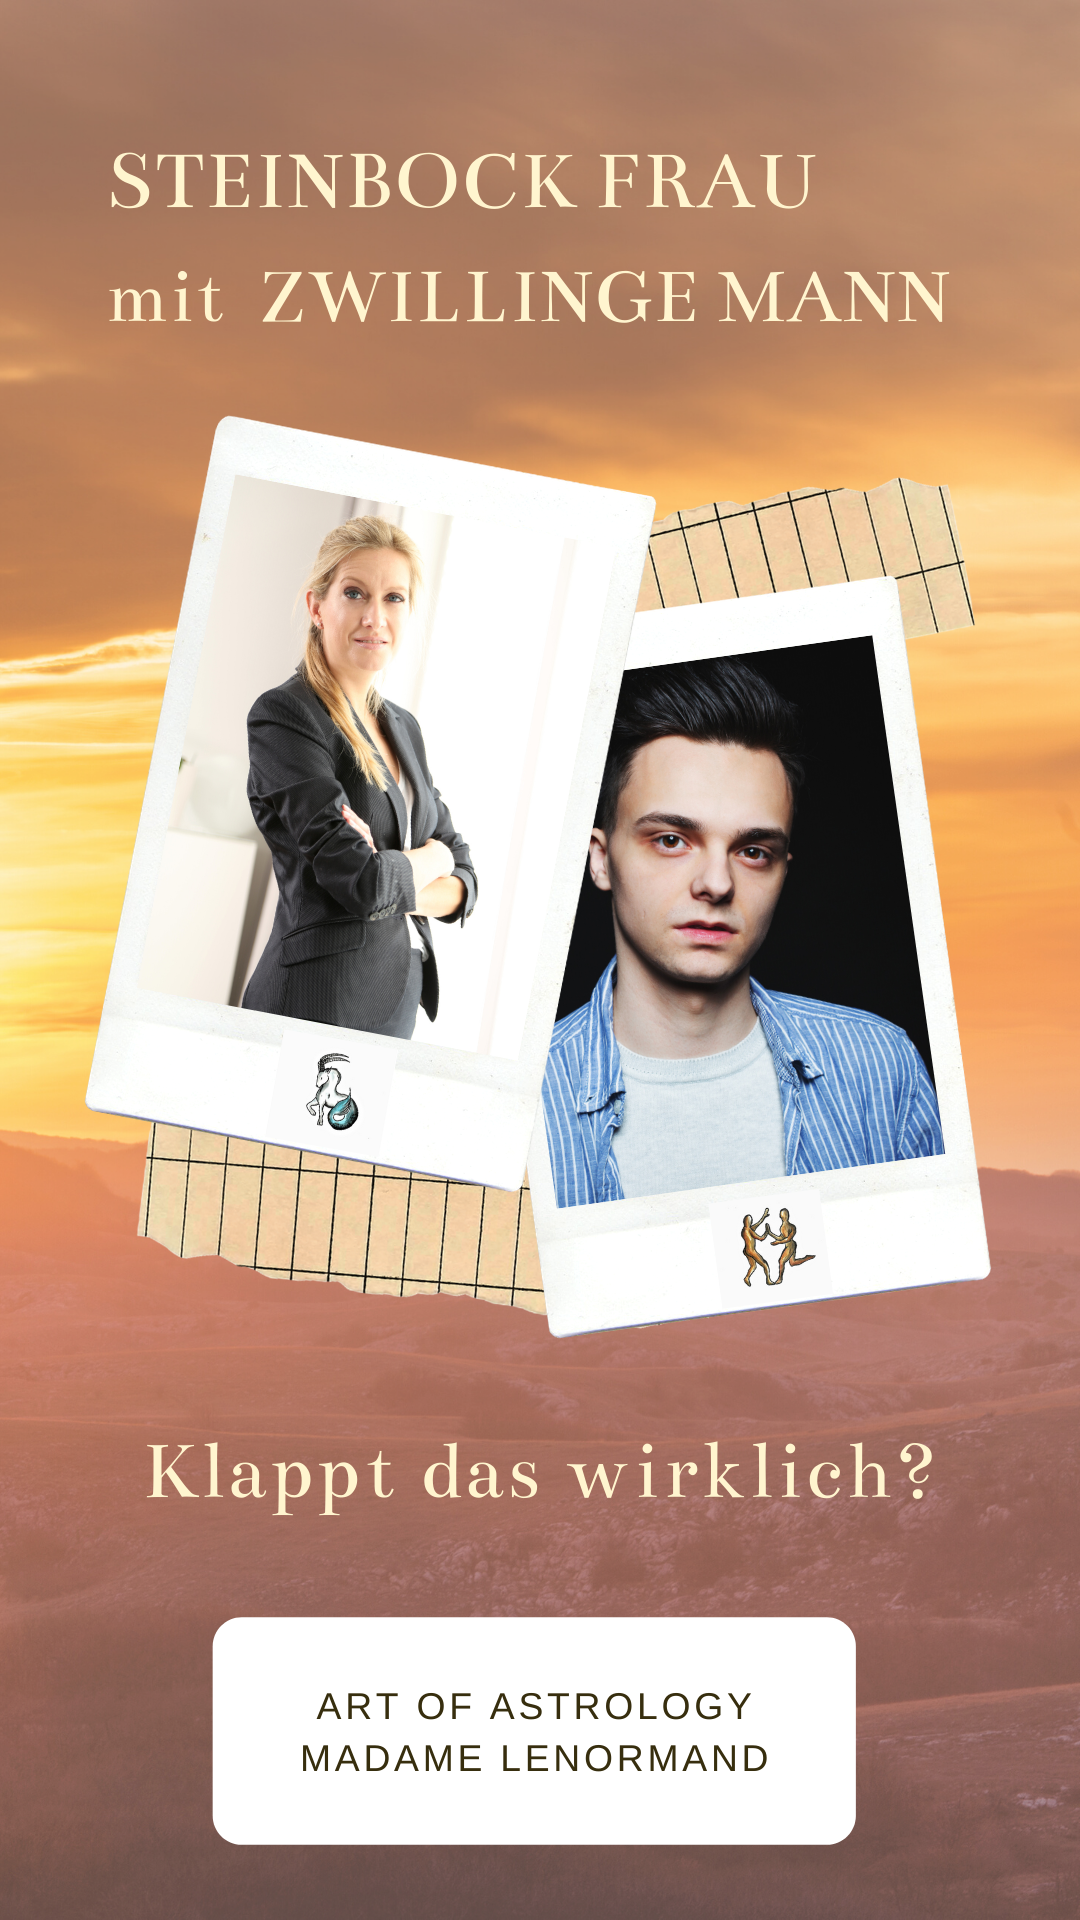 Zwillinge-Mann & Steinbock-Frau   Zwilling mann, Steinbock